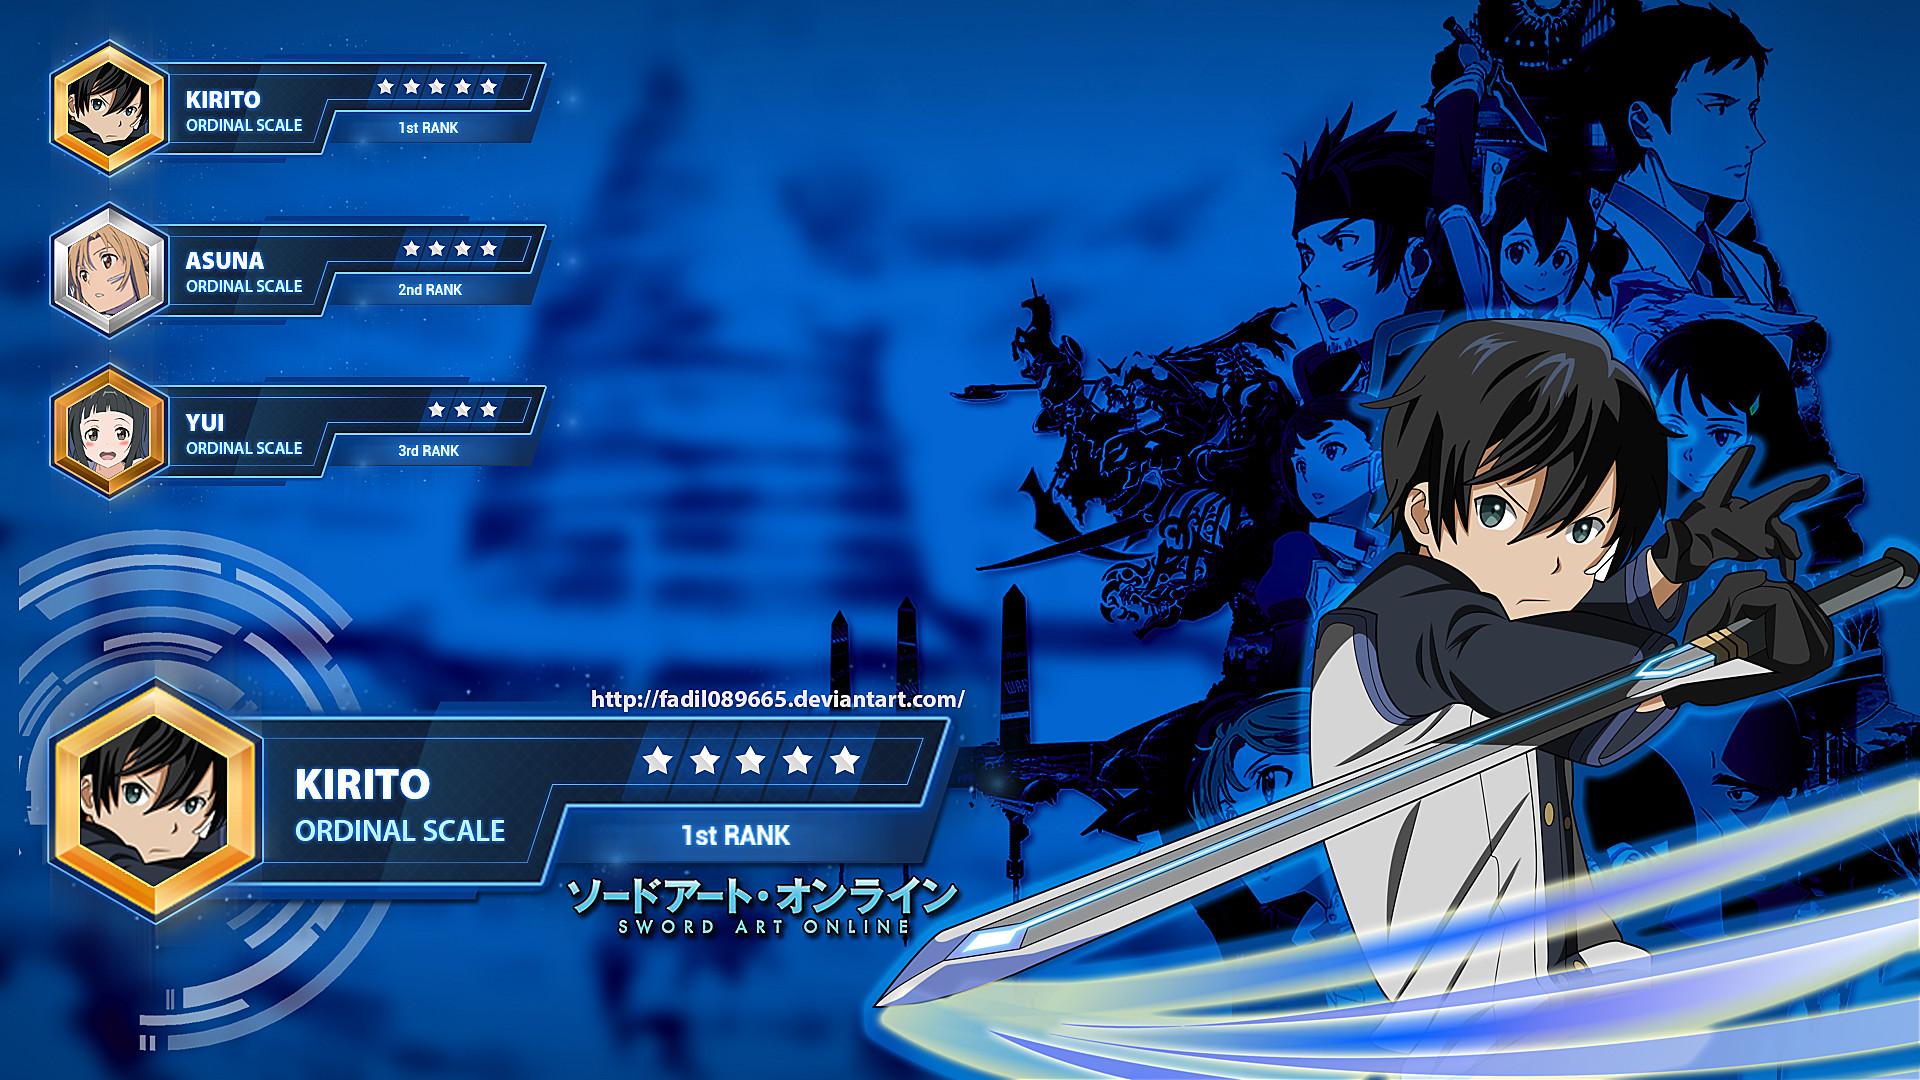 … Sword Art Online Wallpapers Desktop : Kirito by Fadil089665